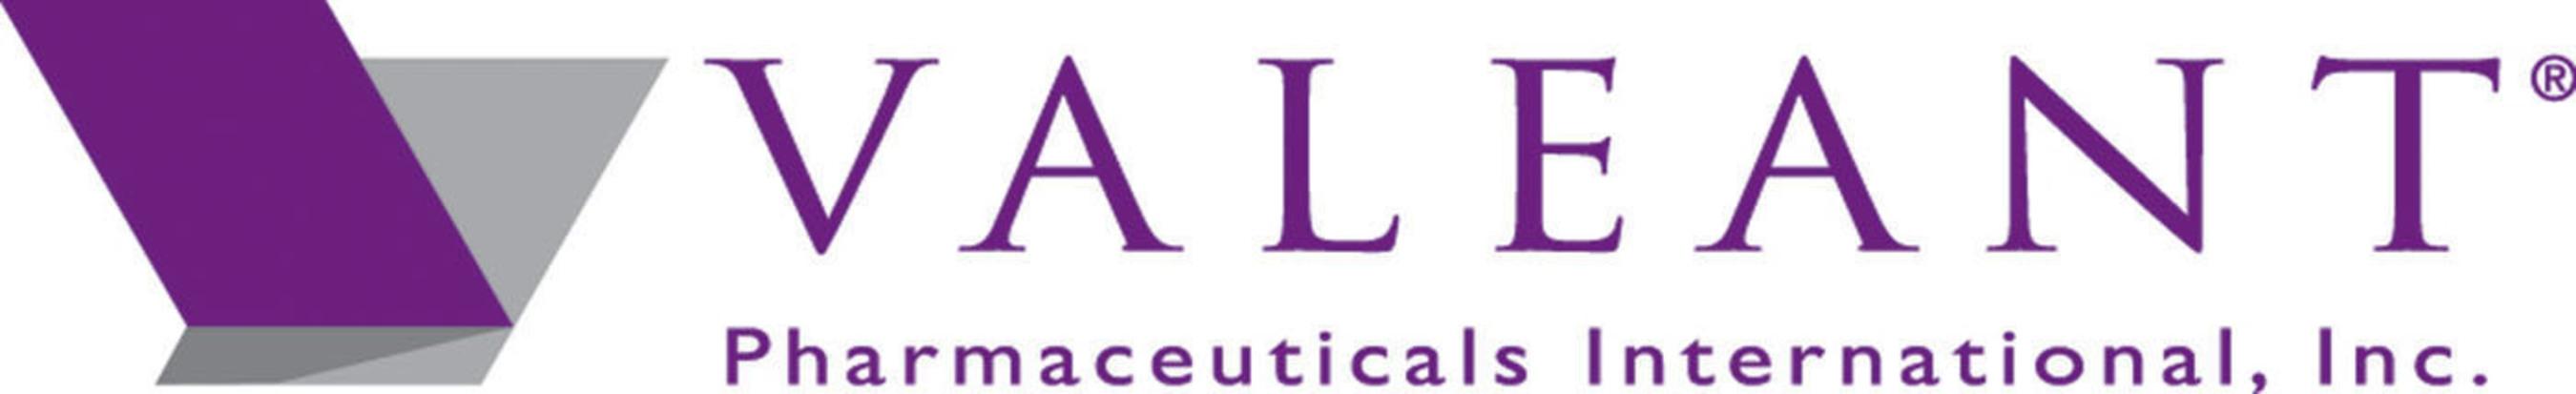 Valeant Pharmaceuticals International, Inc. (PRNewsFoto/Valeant Pharmaceuticals International, Inc.) (PRNewsFoto/) (PRNewsFoto/)